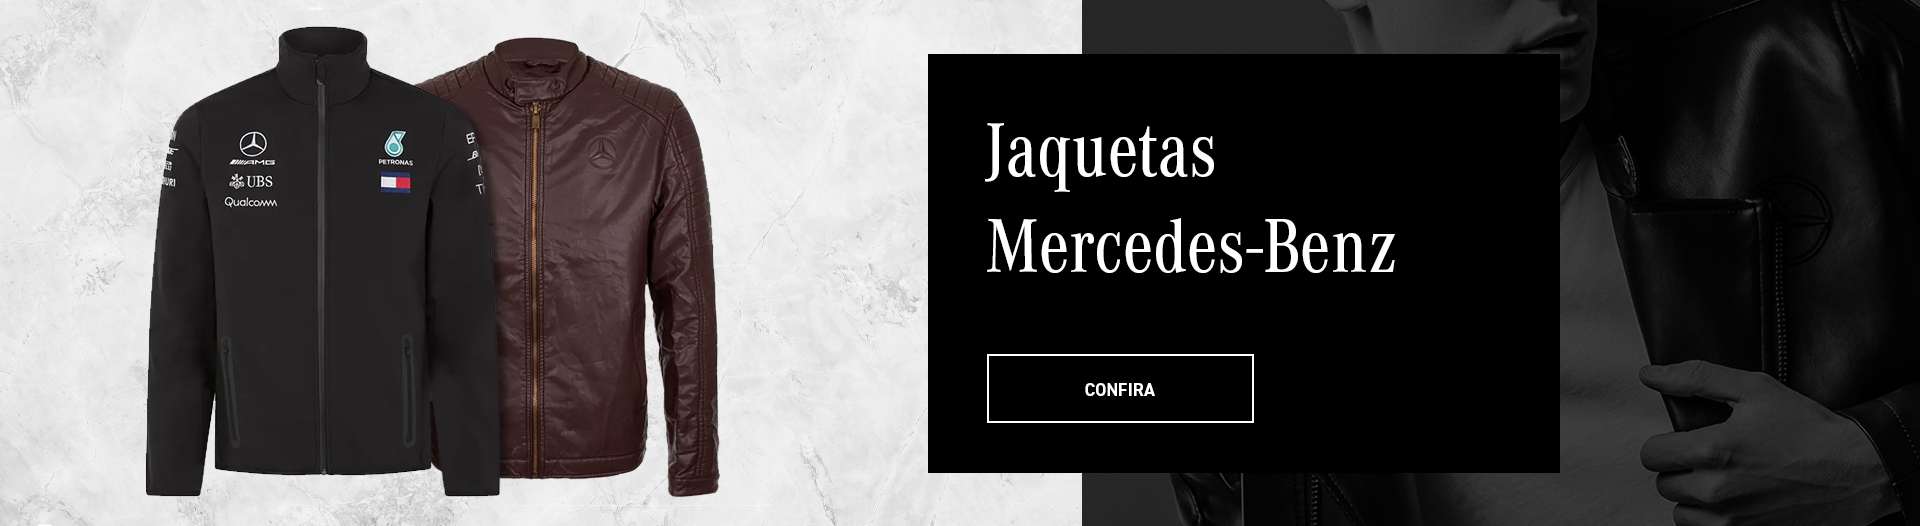 Banner - Jaquetas